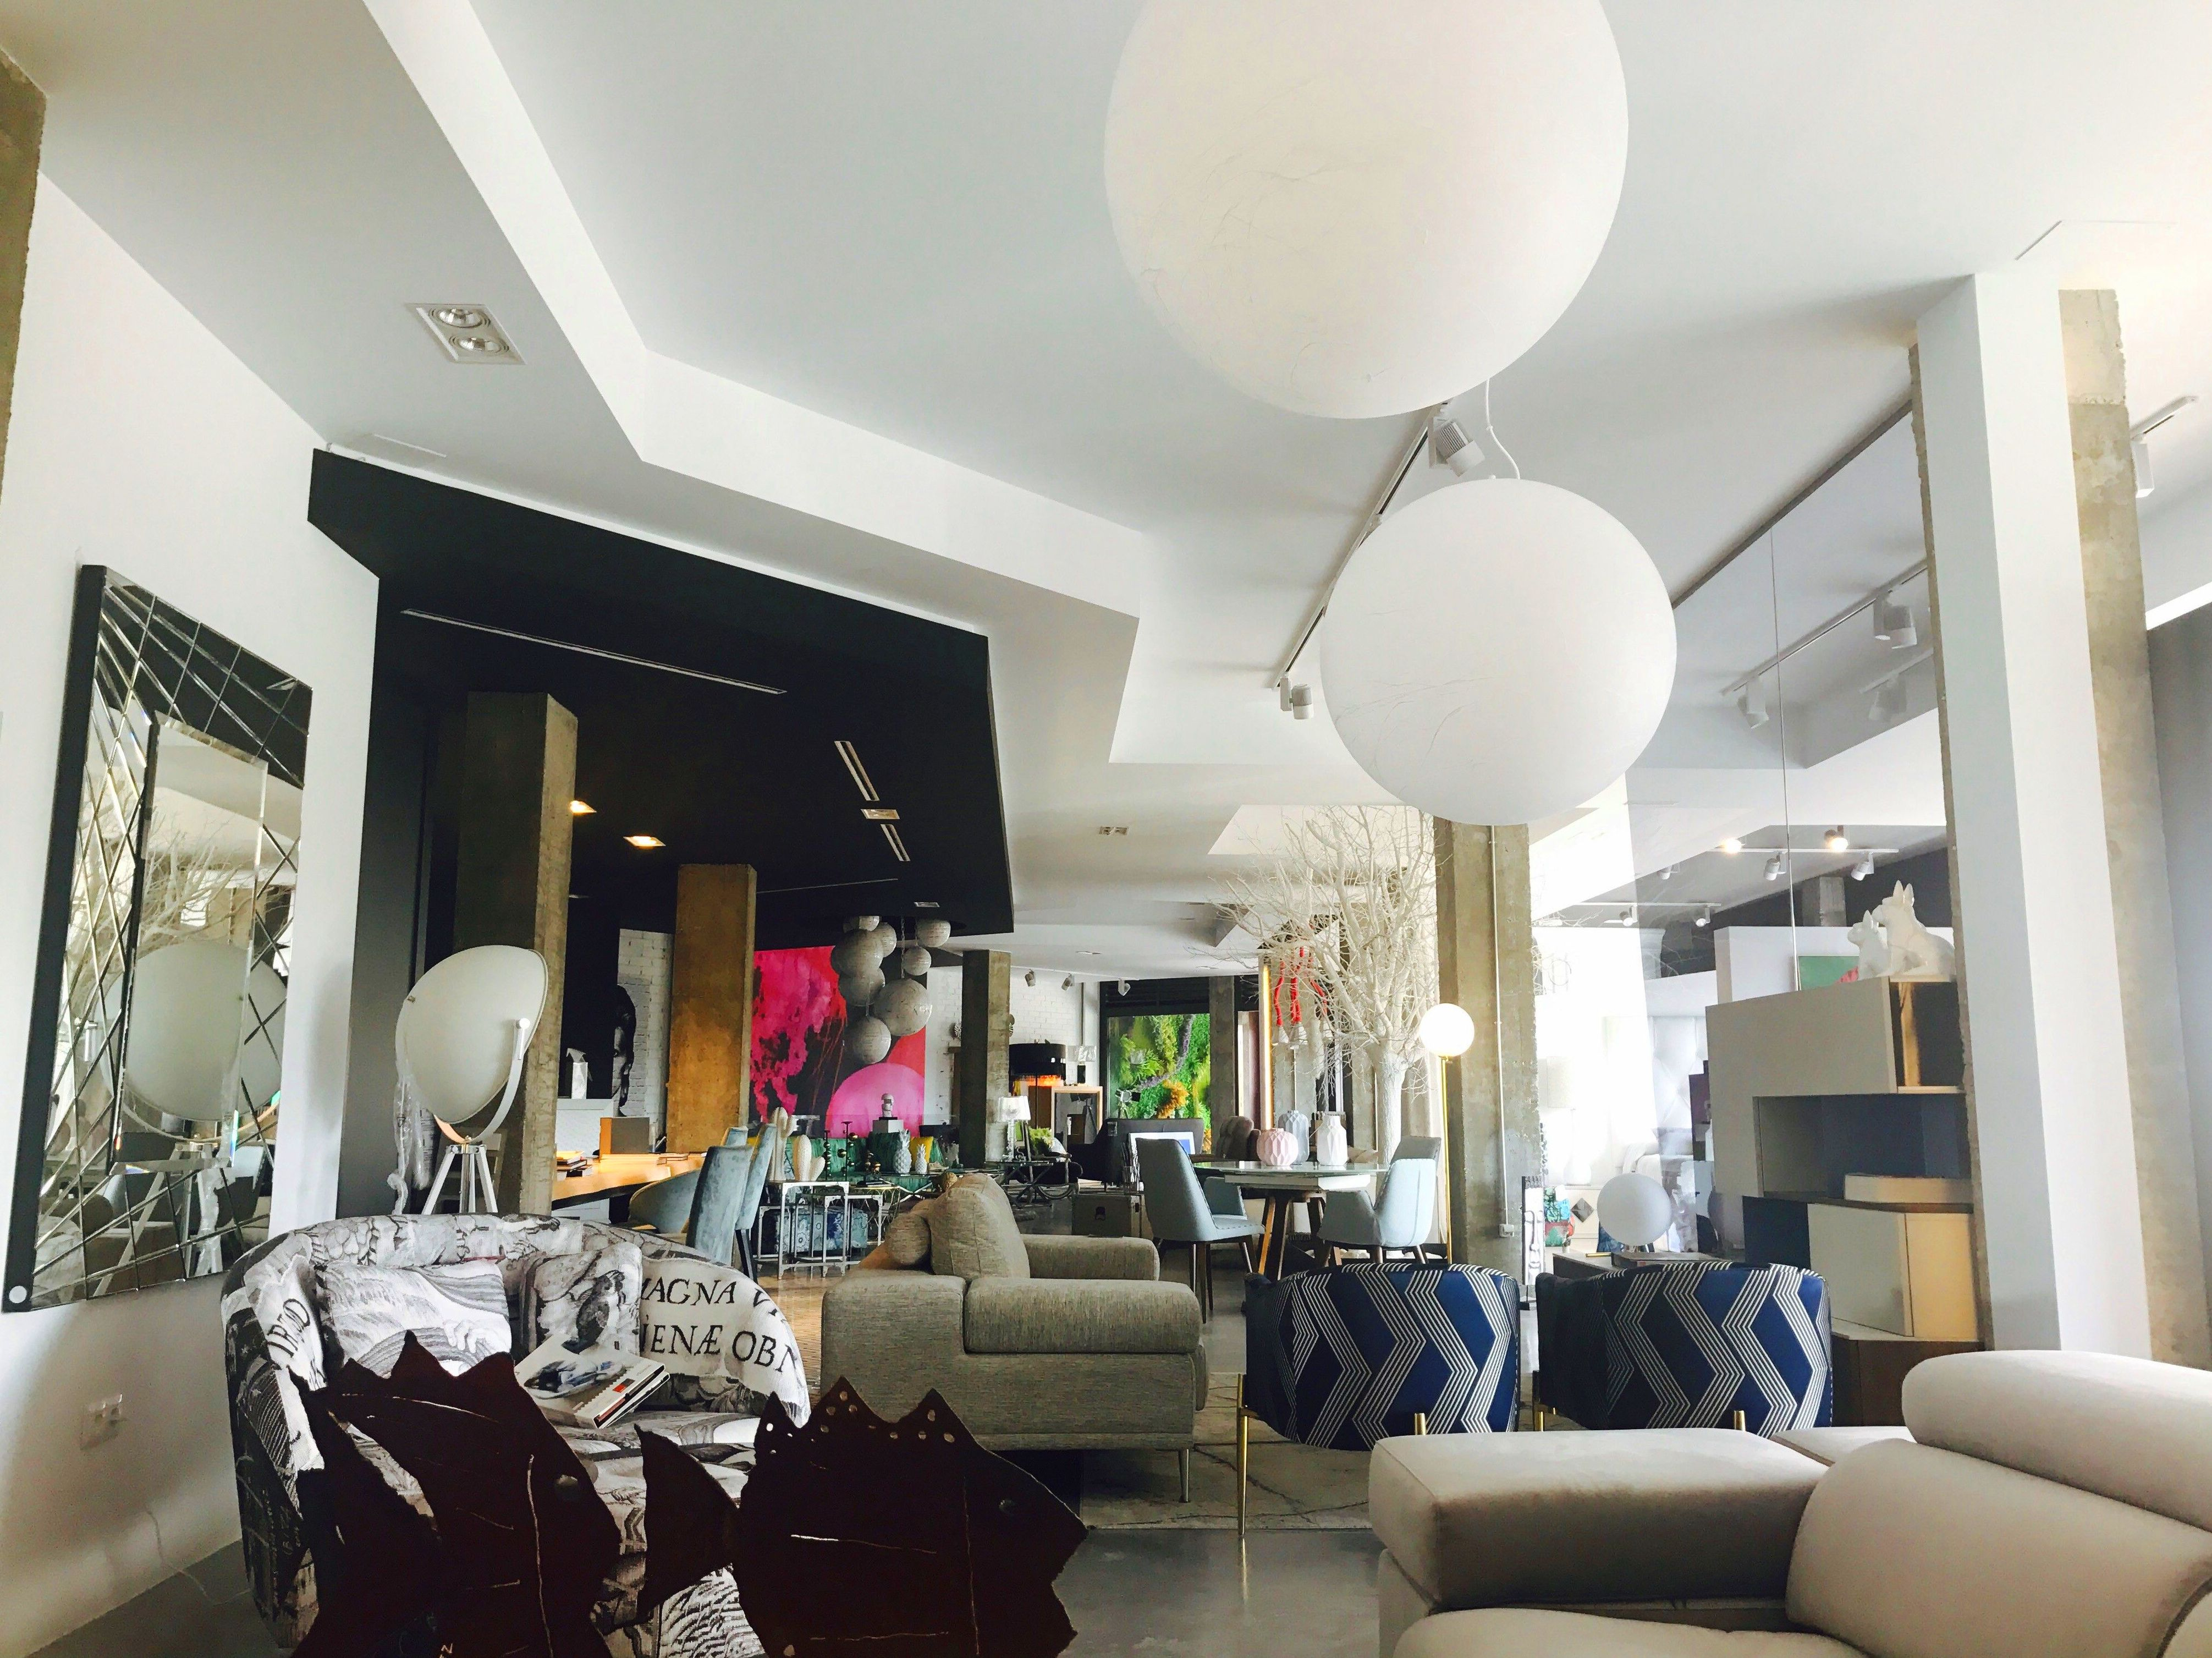 Foto 2 de Muebles en Getafe | Goga Muebles & Complementos